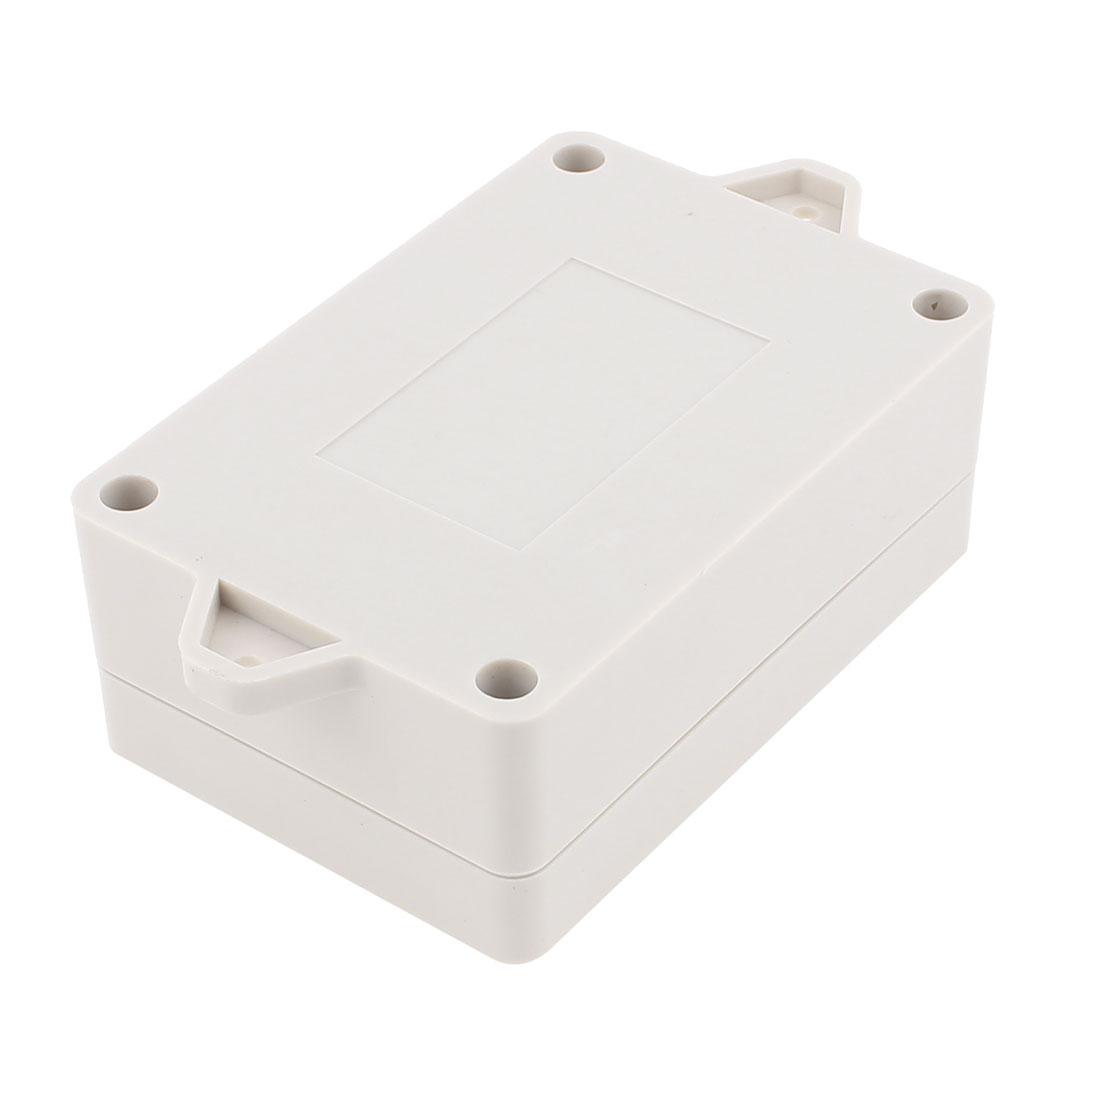 124mm-x-68mm-x-40mm-Waterproof-Junction-Box-DIY-Terminal-Connect-Enclosure